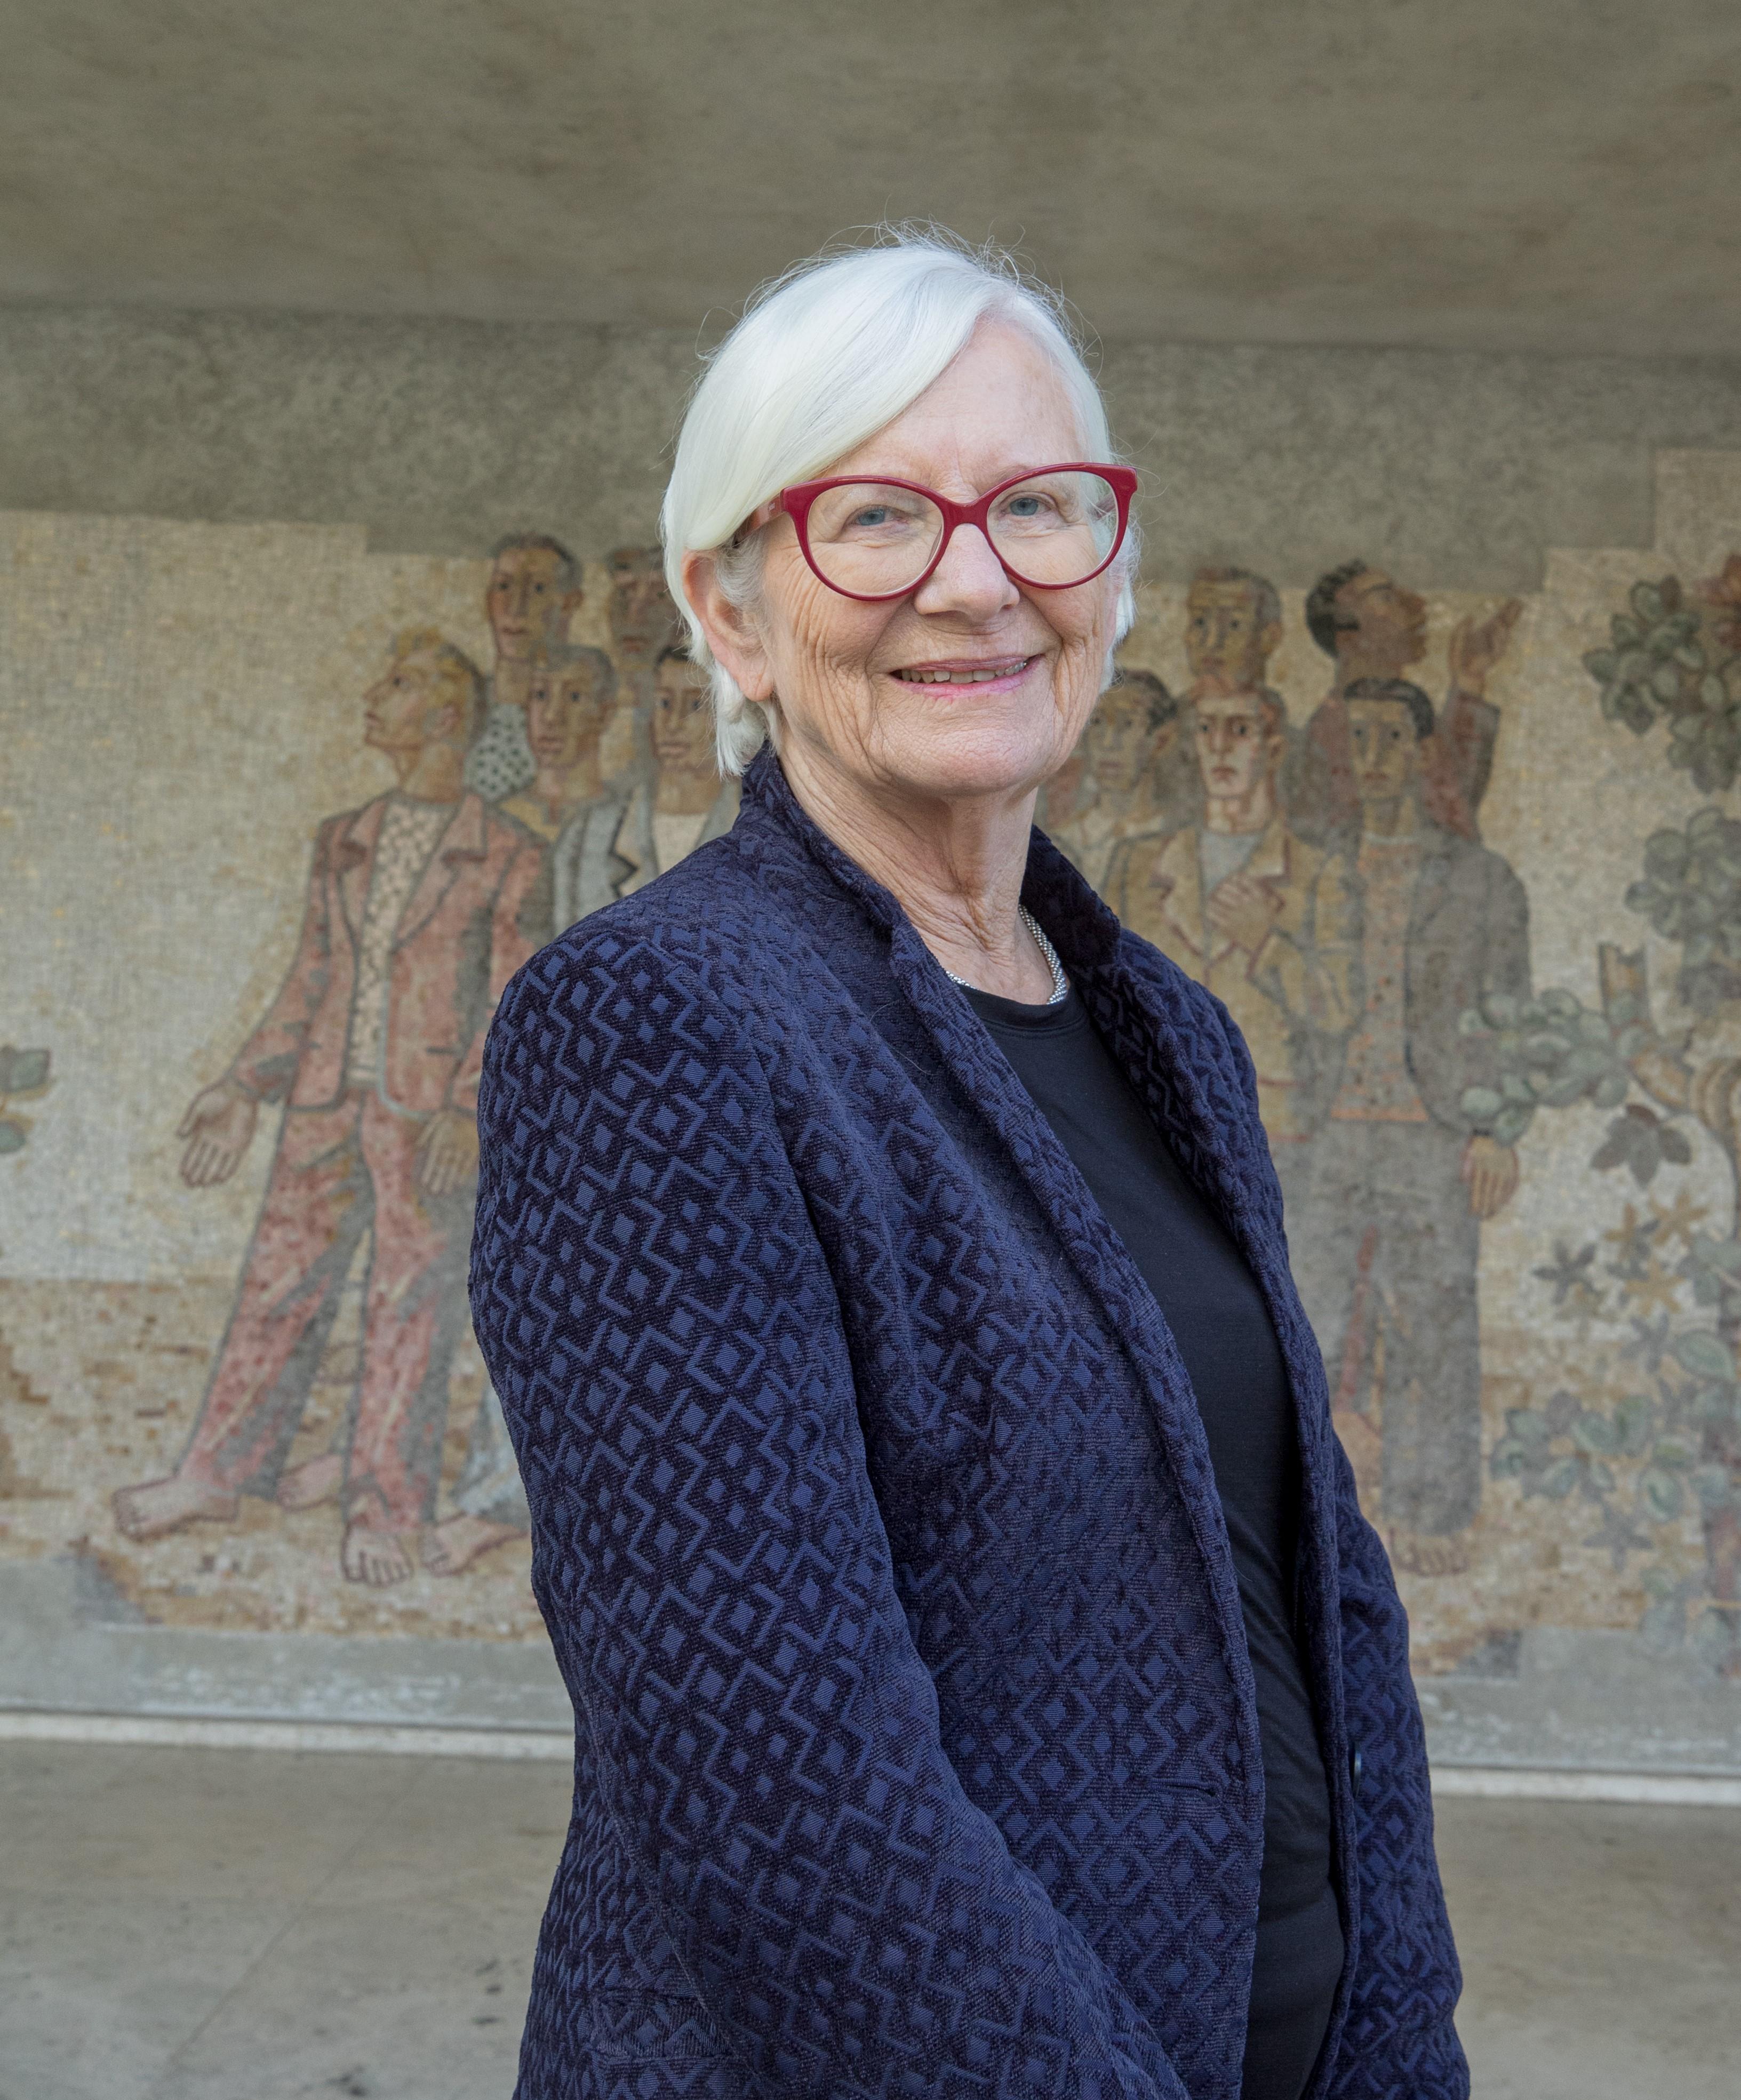 Portraitfoto Pfr.in Dr.in Christa Gäbler